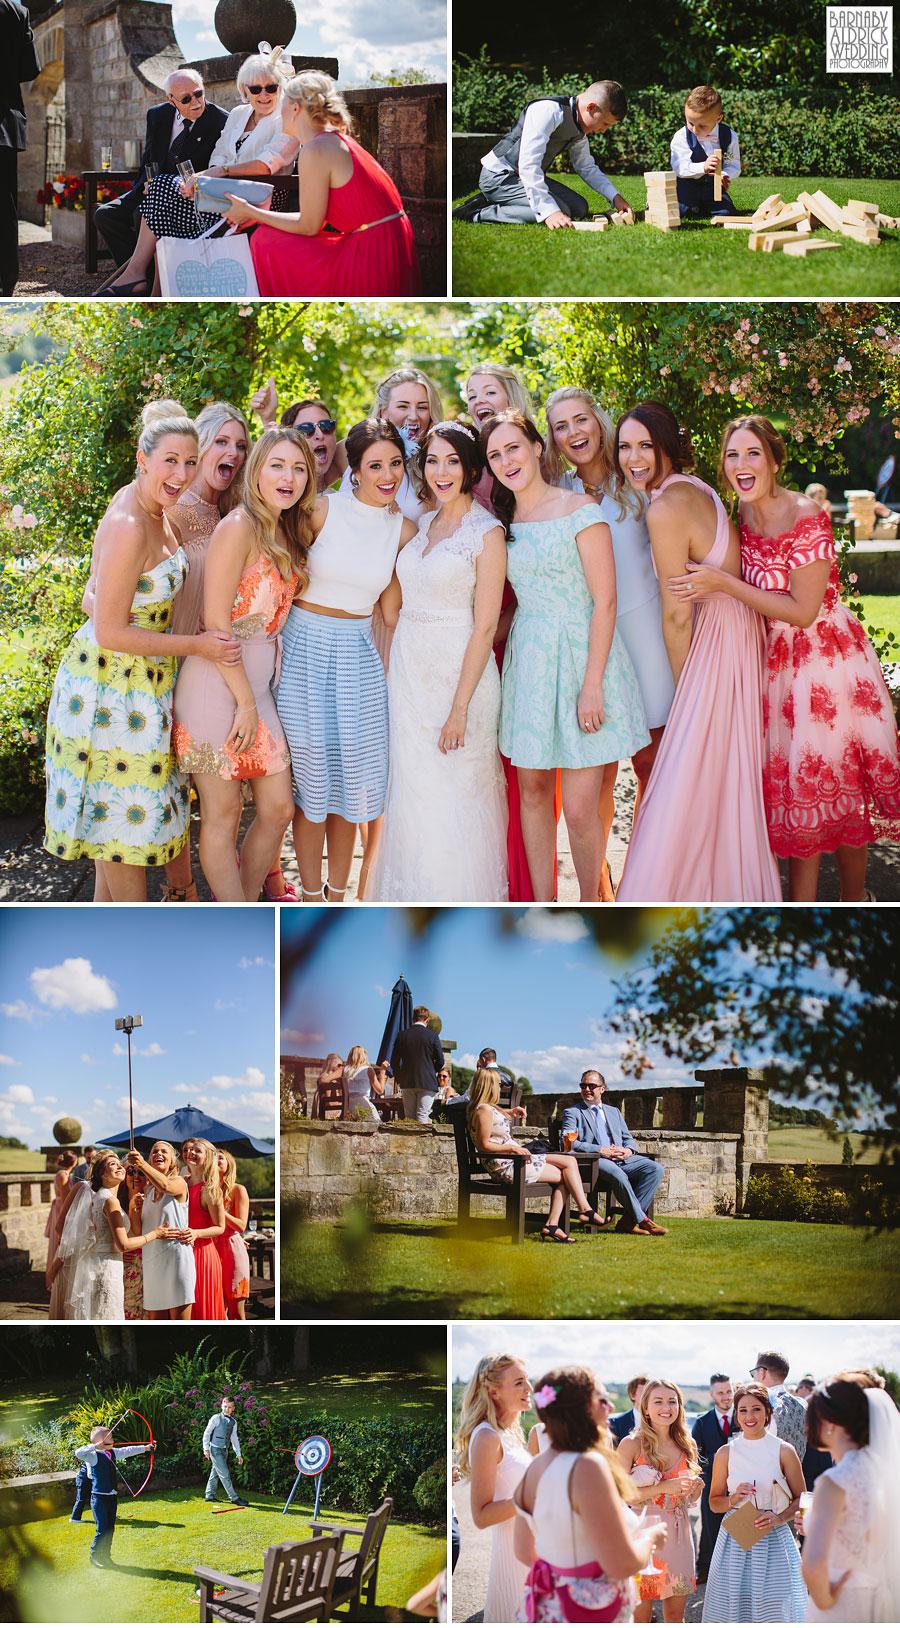 Wood Hall Linton Wetherby Wedding Photography 054